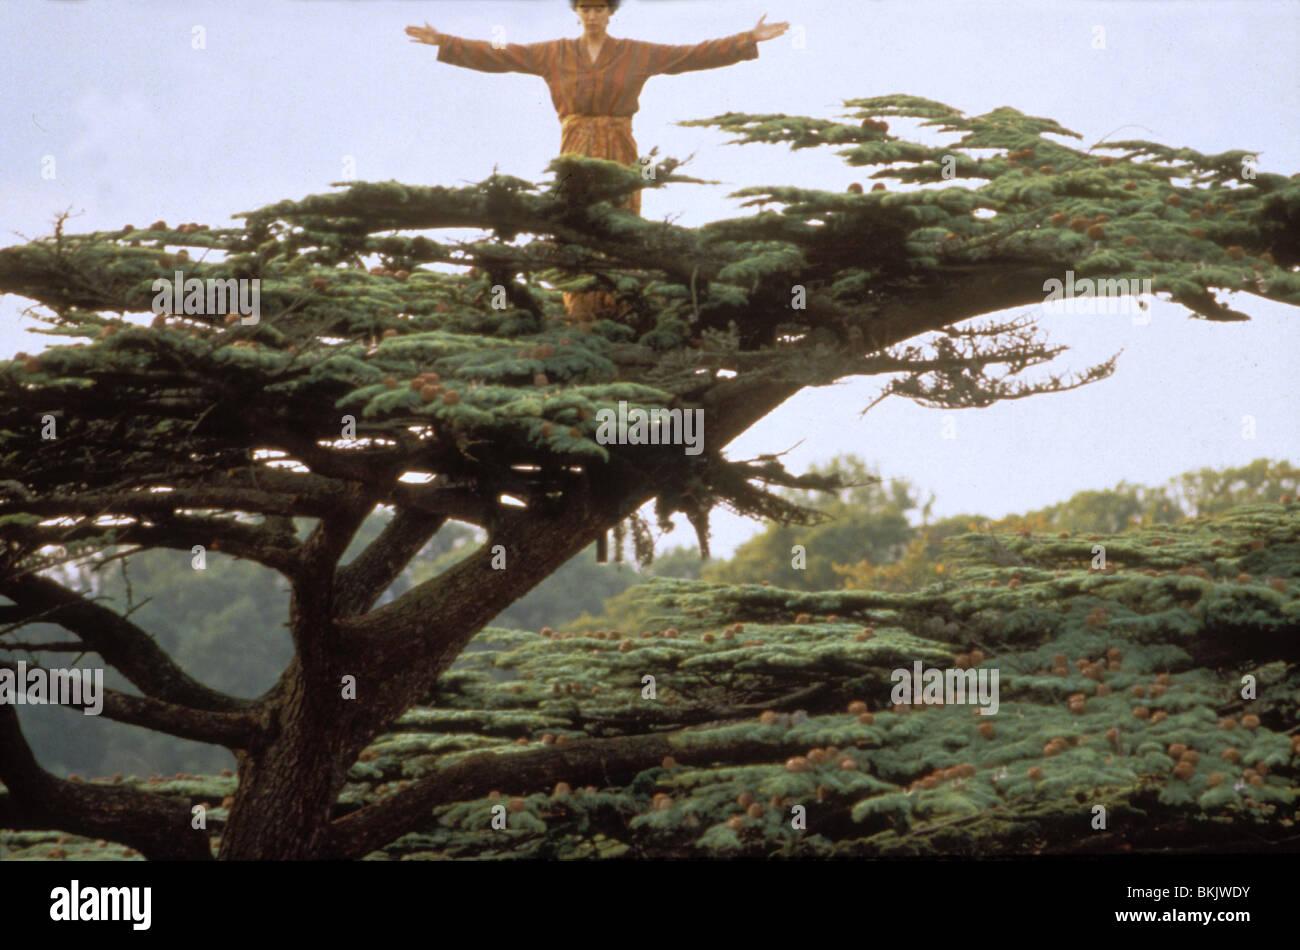 PRINZESSIN CARABOO (1994) PHOEBE CATES PRCR 040 Stockbild